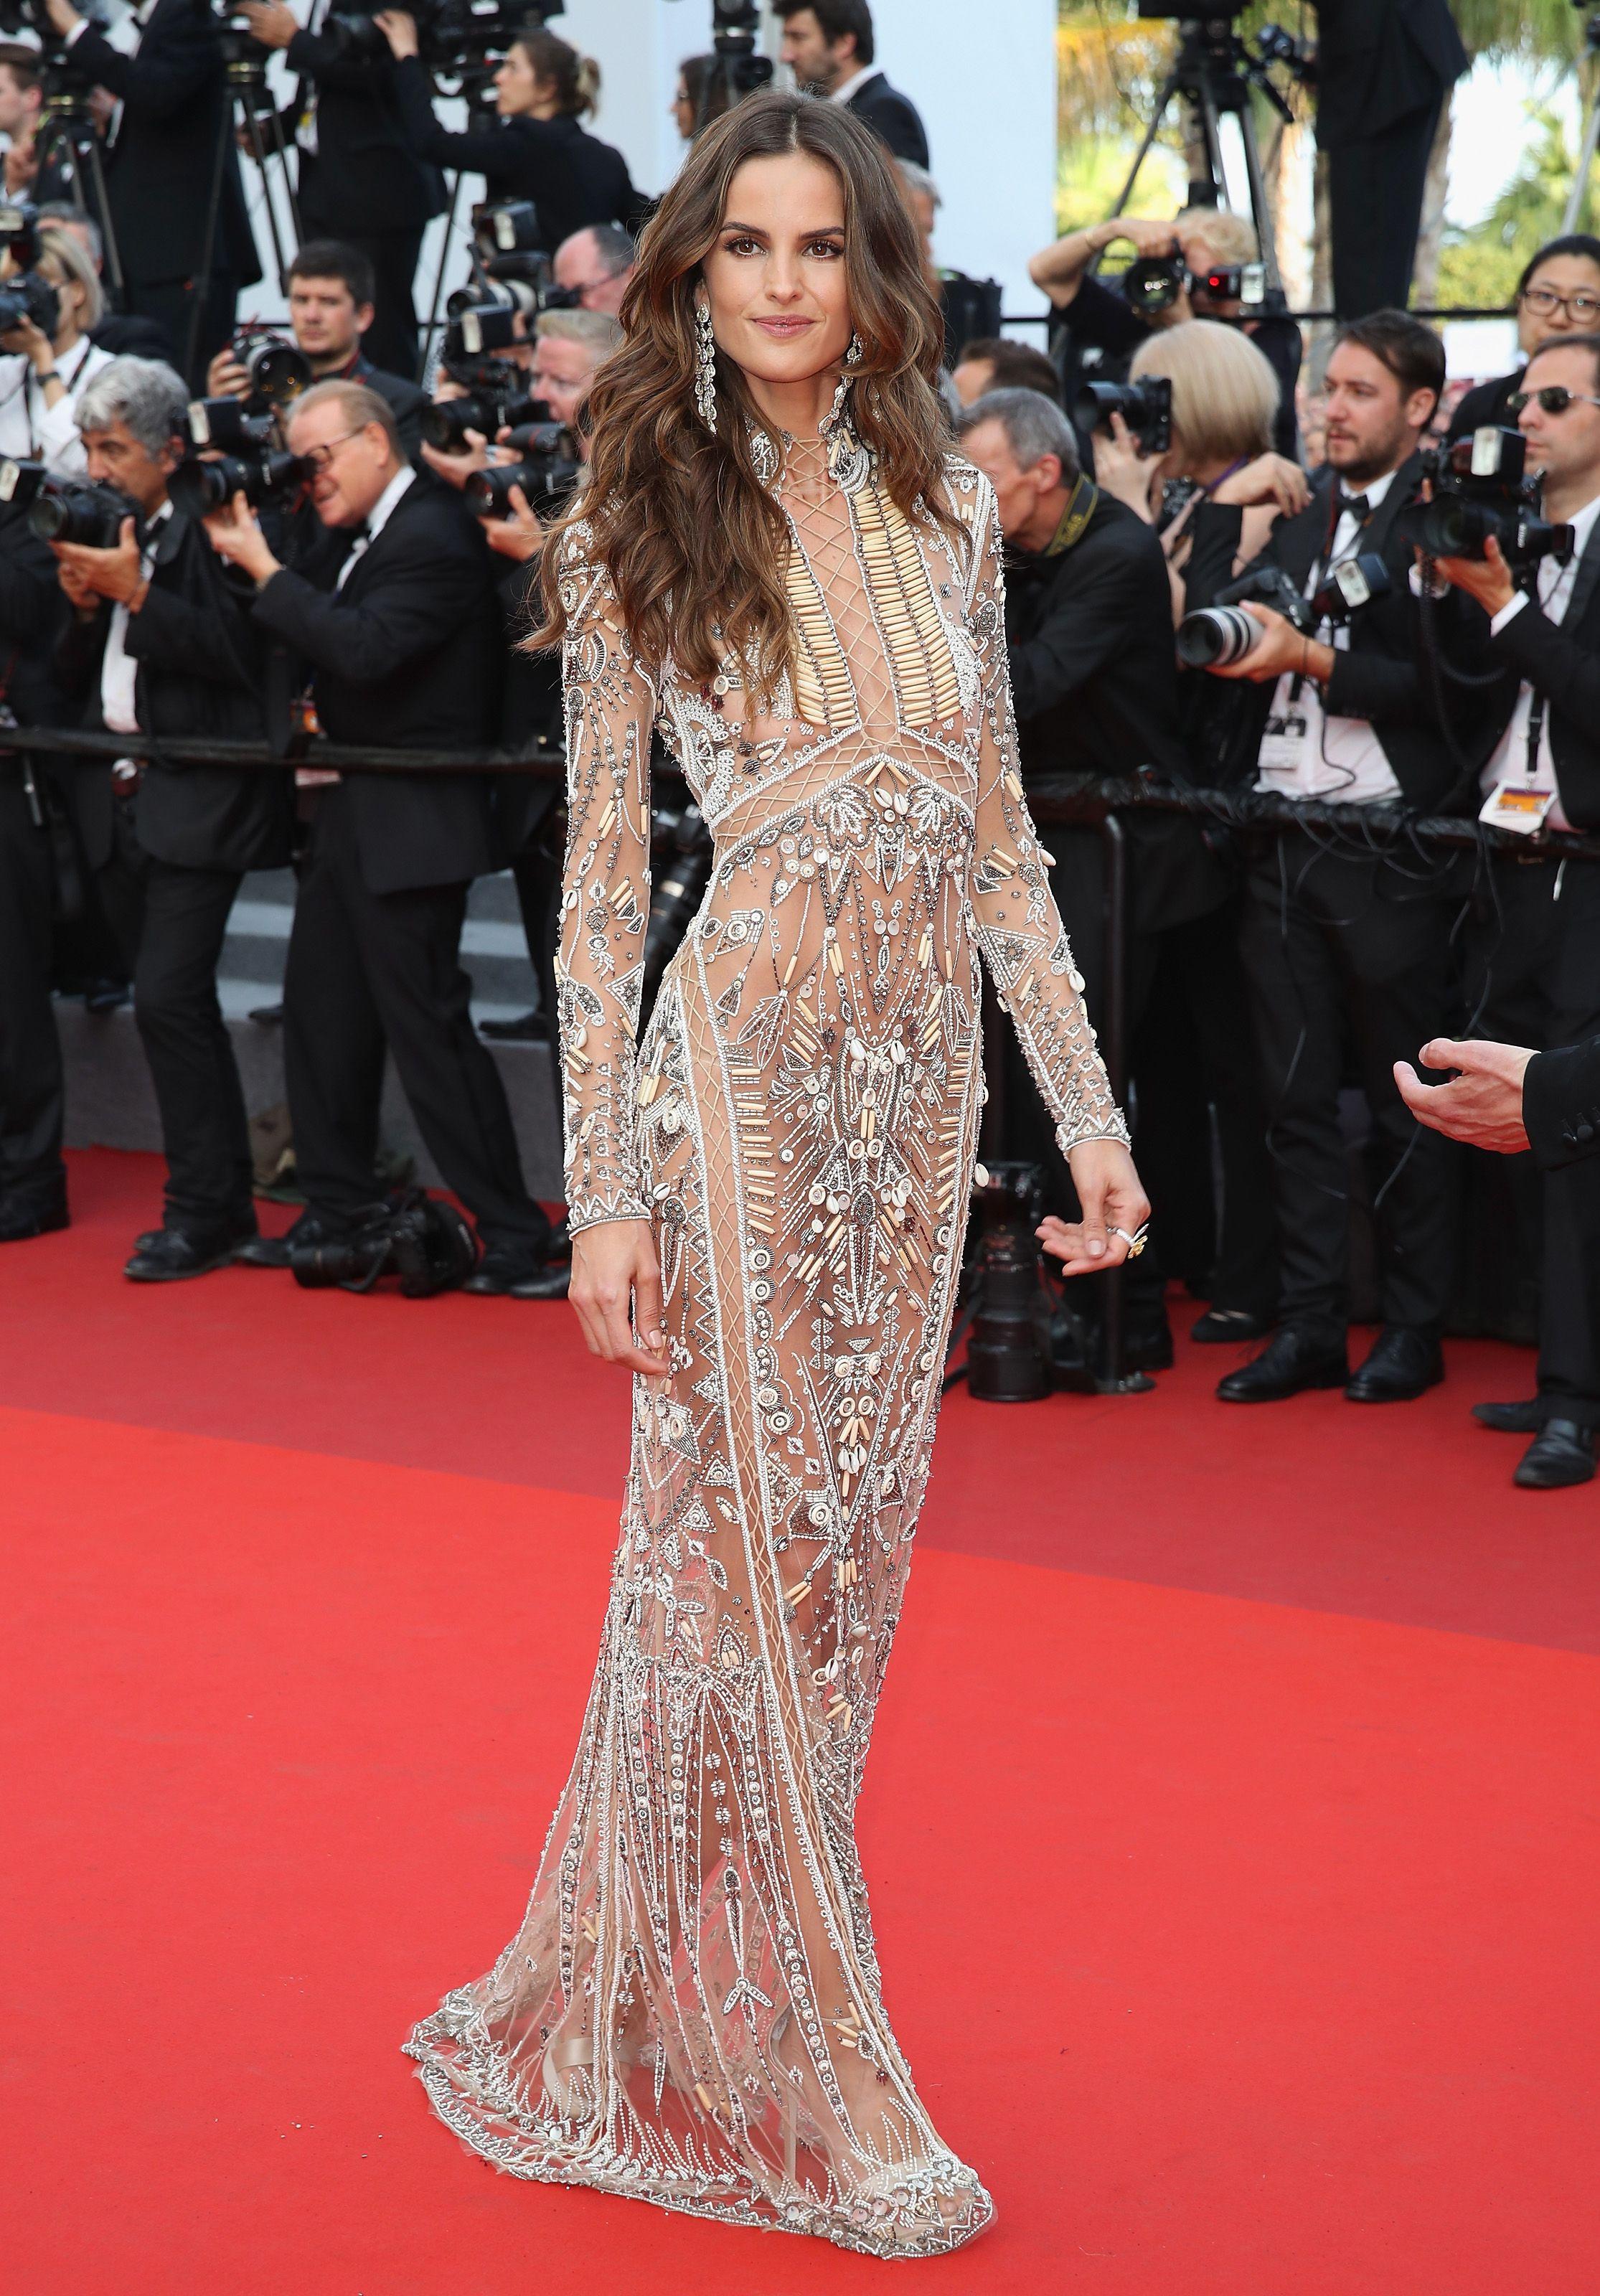 IzabelGoulart wearing a high neck, long sleeve, transparent gown ...